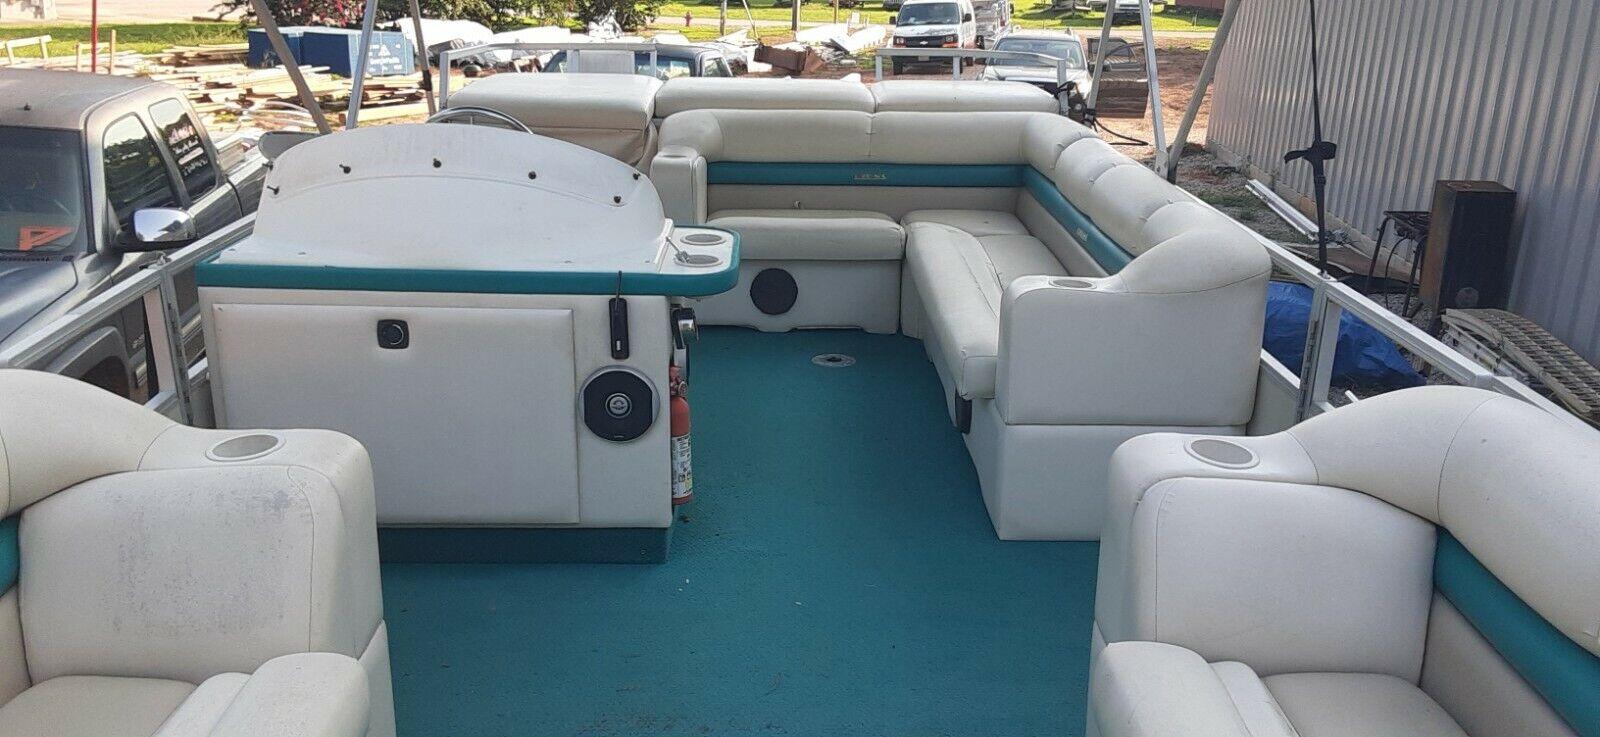 Crest III 25' Pontoon Boat with 90HP Johnson Motor